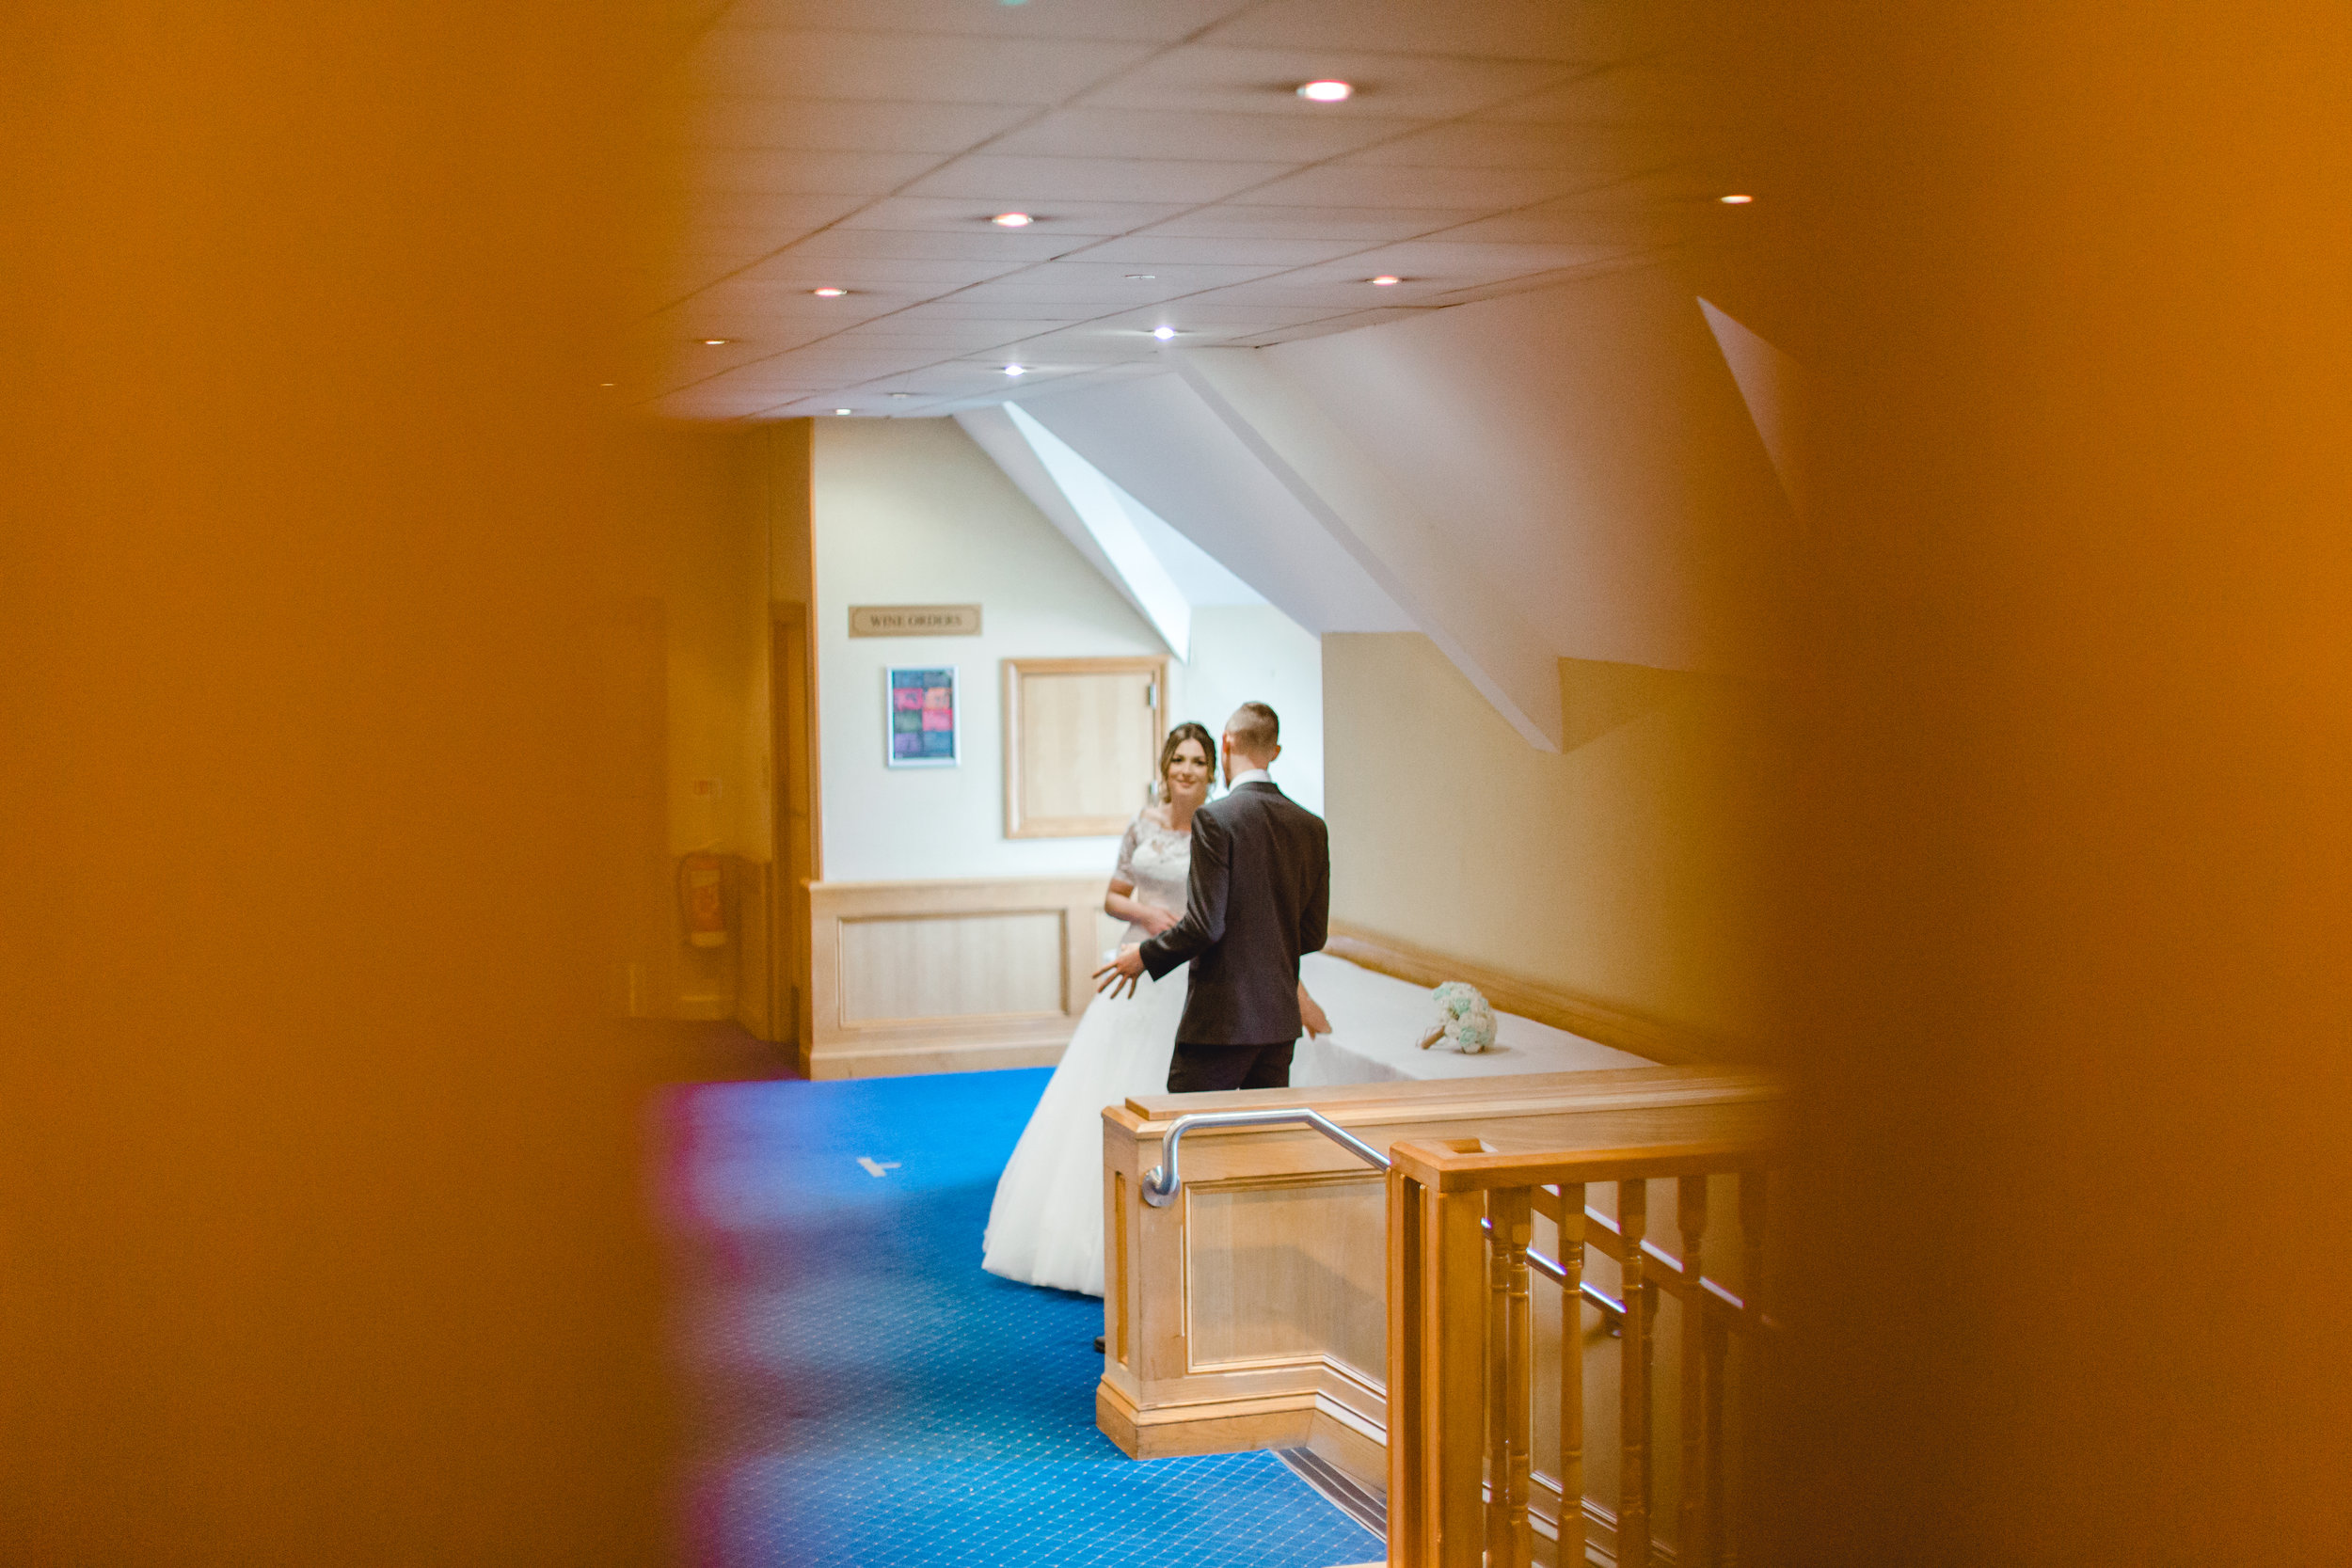 Image of bride and groom before entering the wedding breakfast room